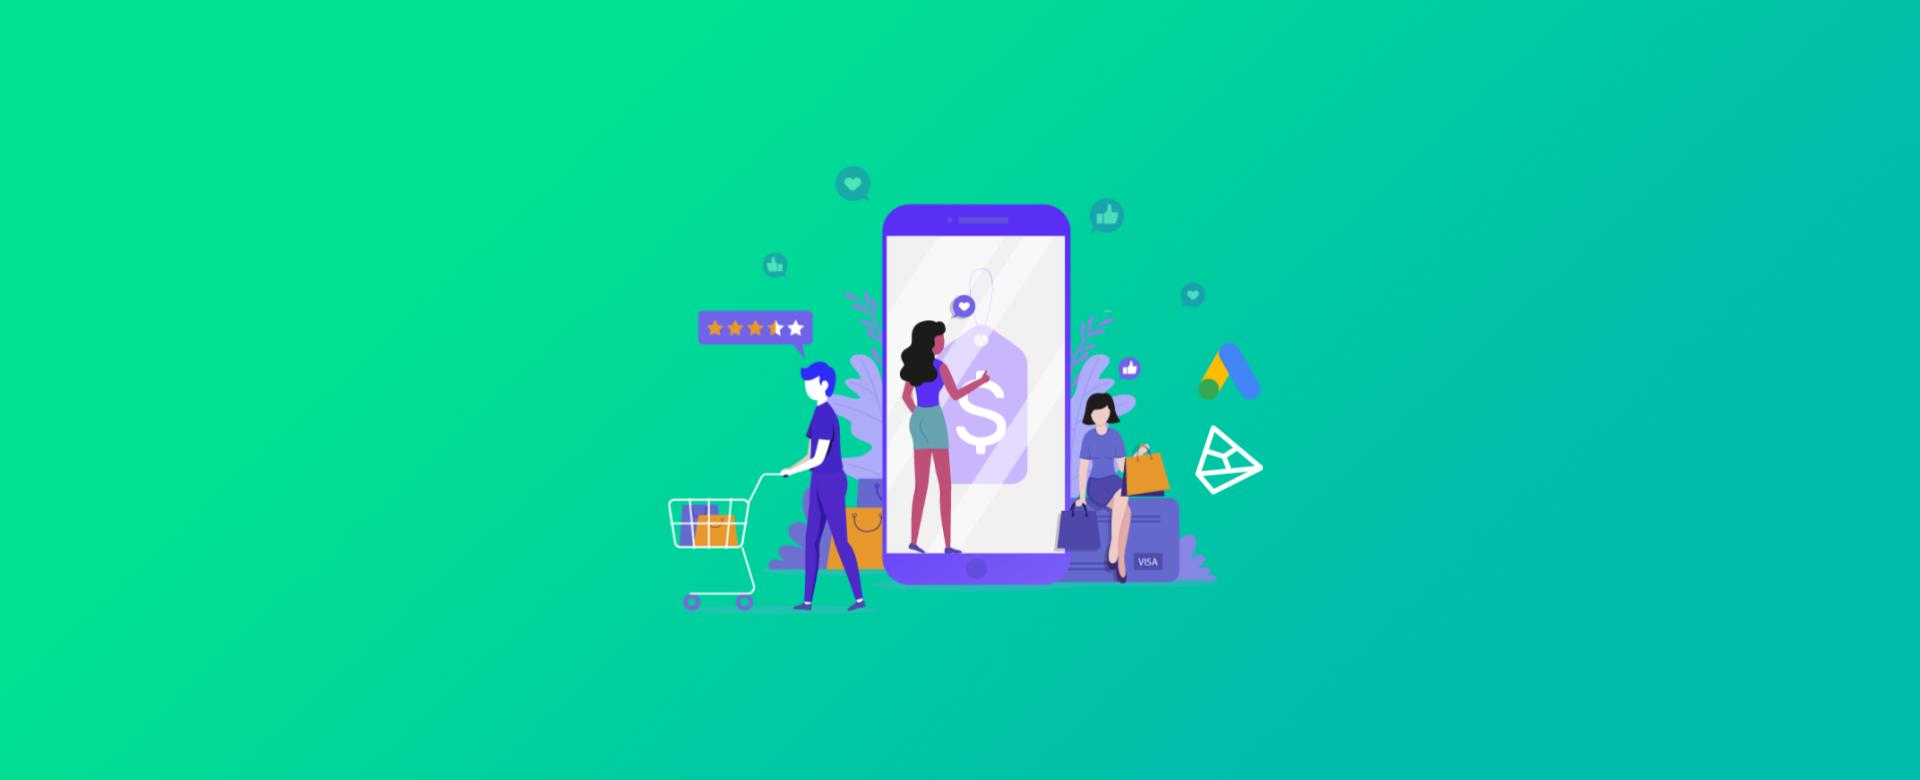 Estrutura Pareto de Google Shopping – Finalista no Google Awards 2017 e 2018